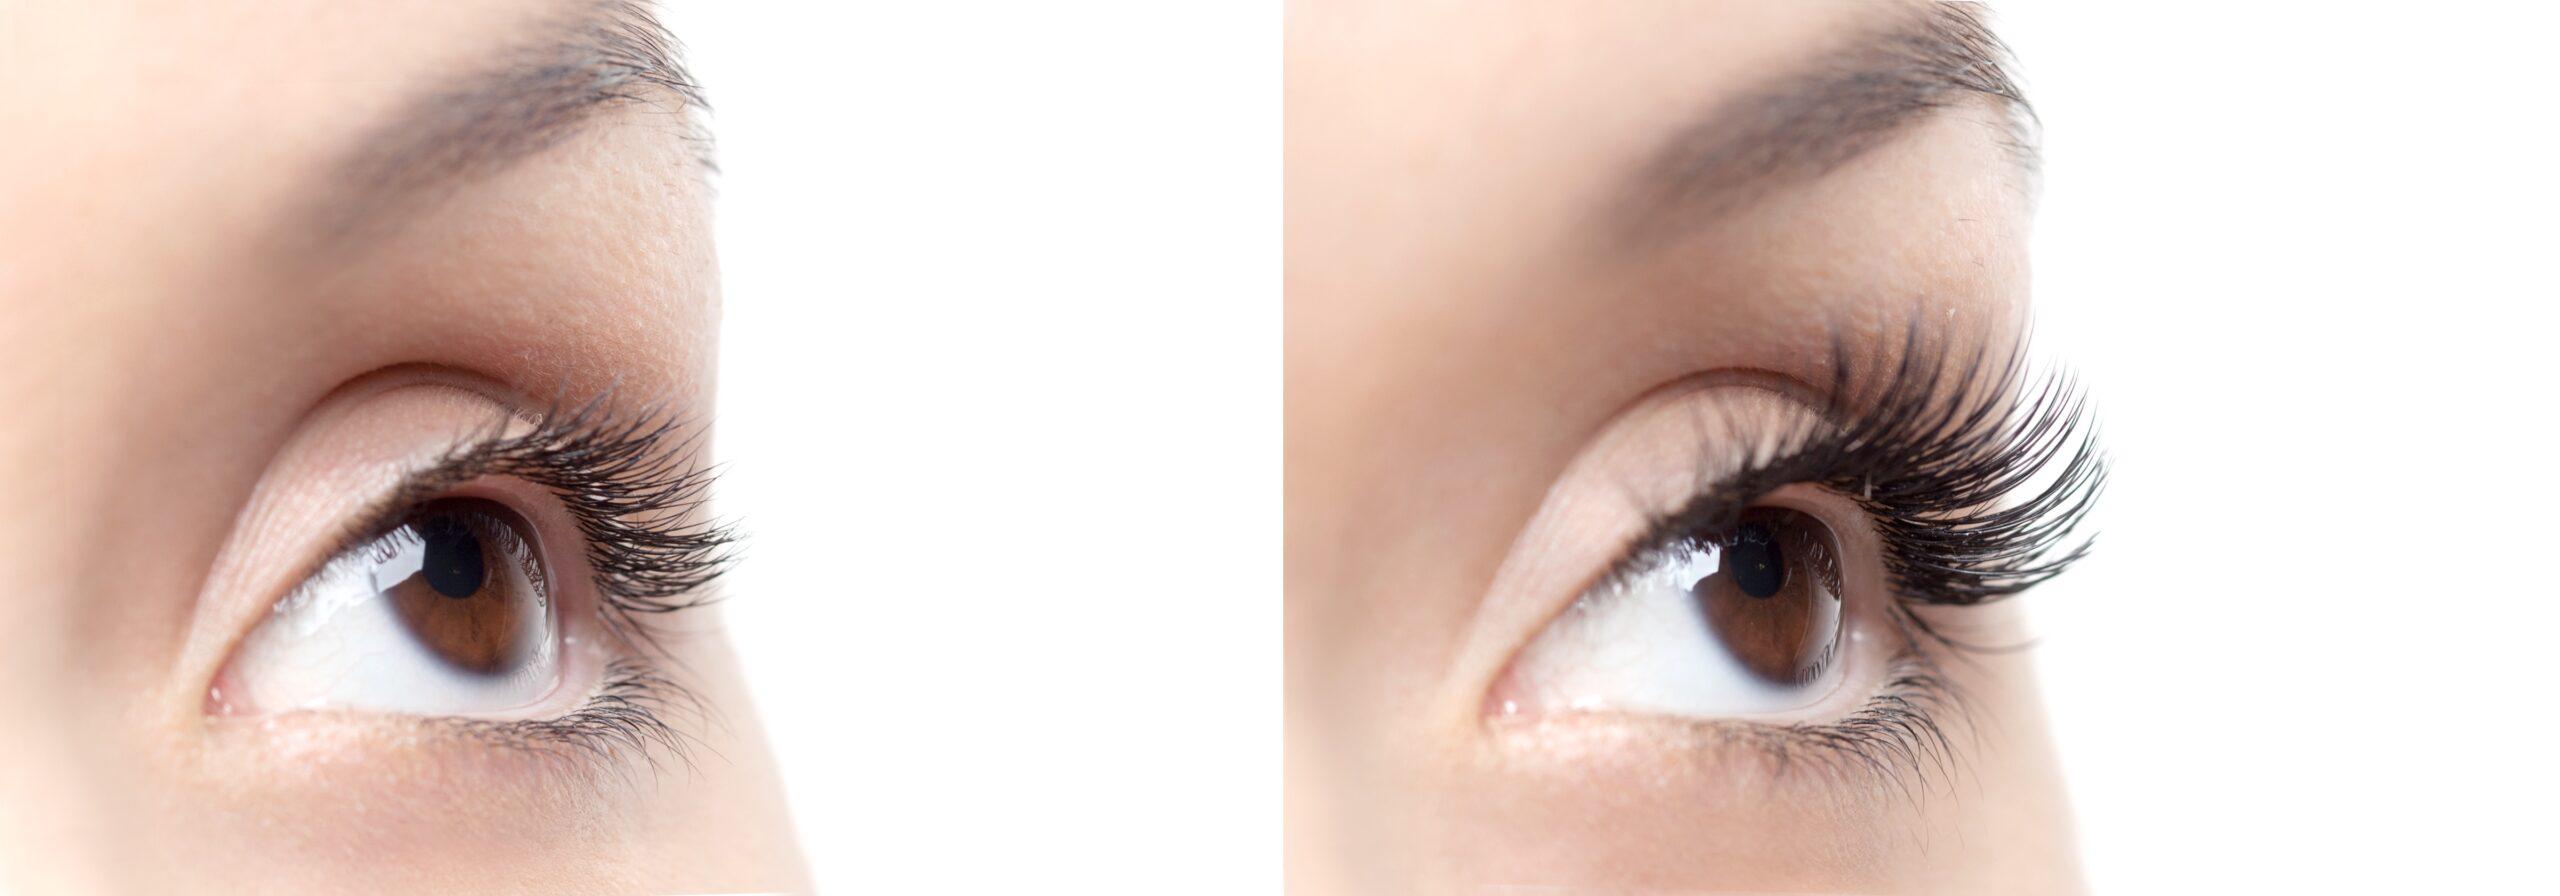 eyelash extension removal near me